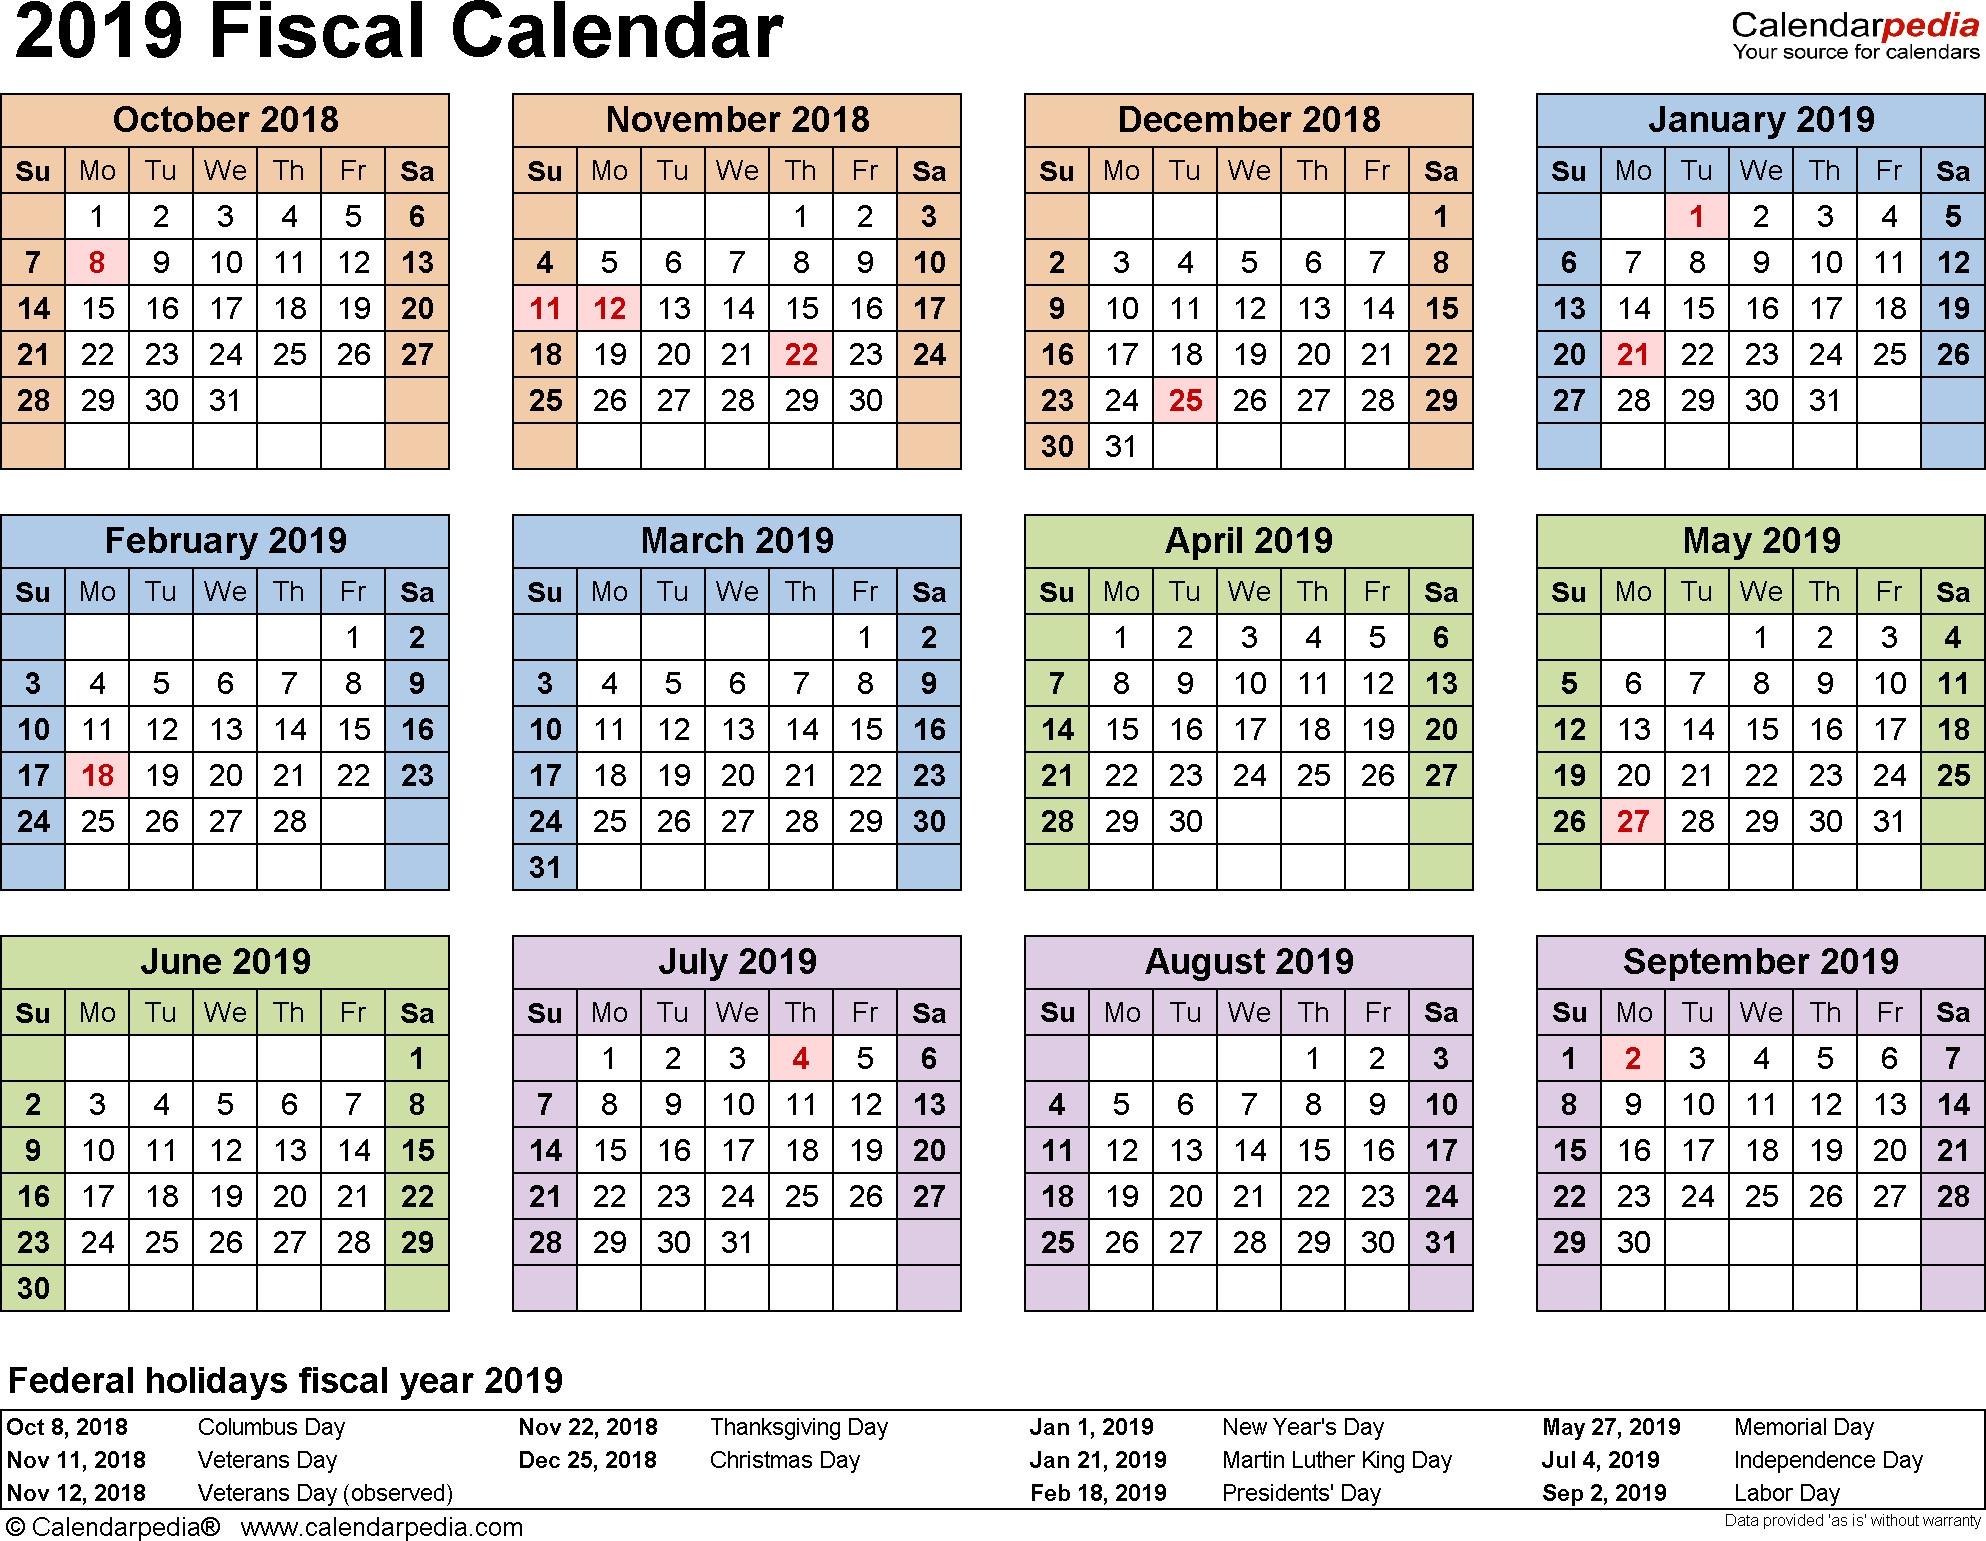 Paper Source Calendars 2019 | Moneksy Calendar 2019 Paper Source